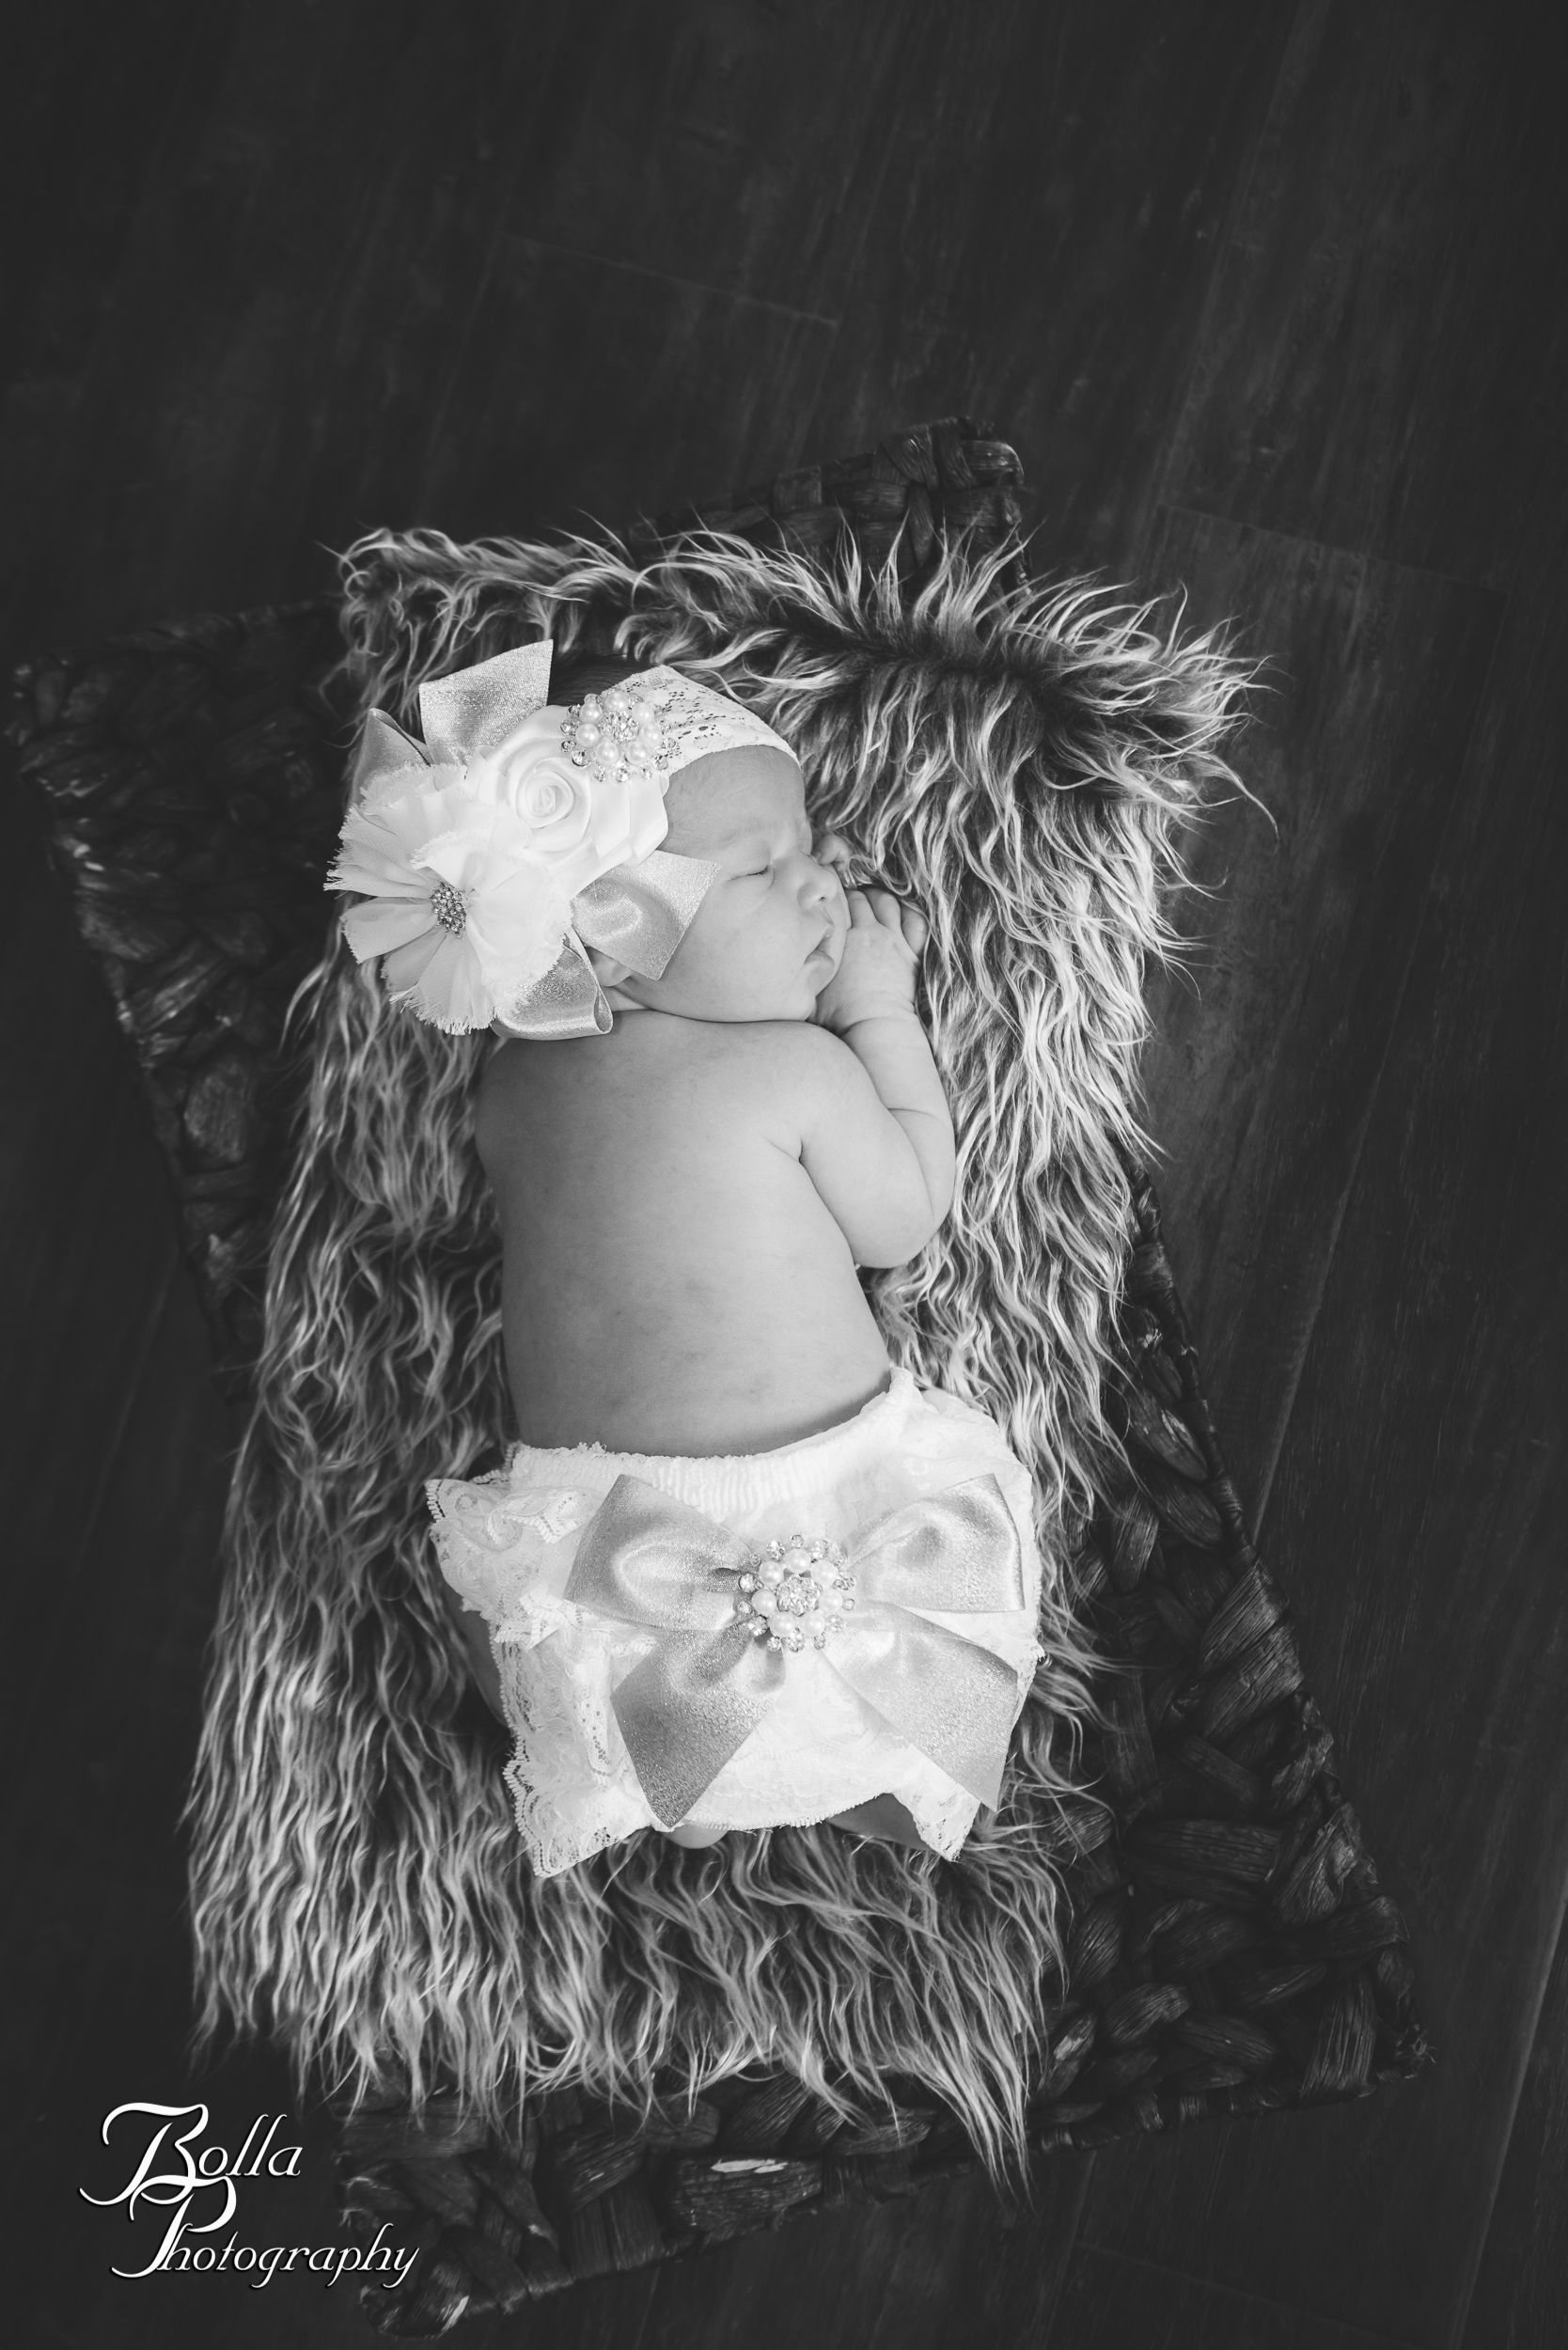 20170529_Bolla photography edwardsville wedding newborn photographer st louis weddings babies-2-3.jpg